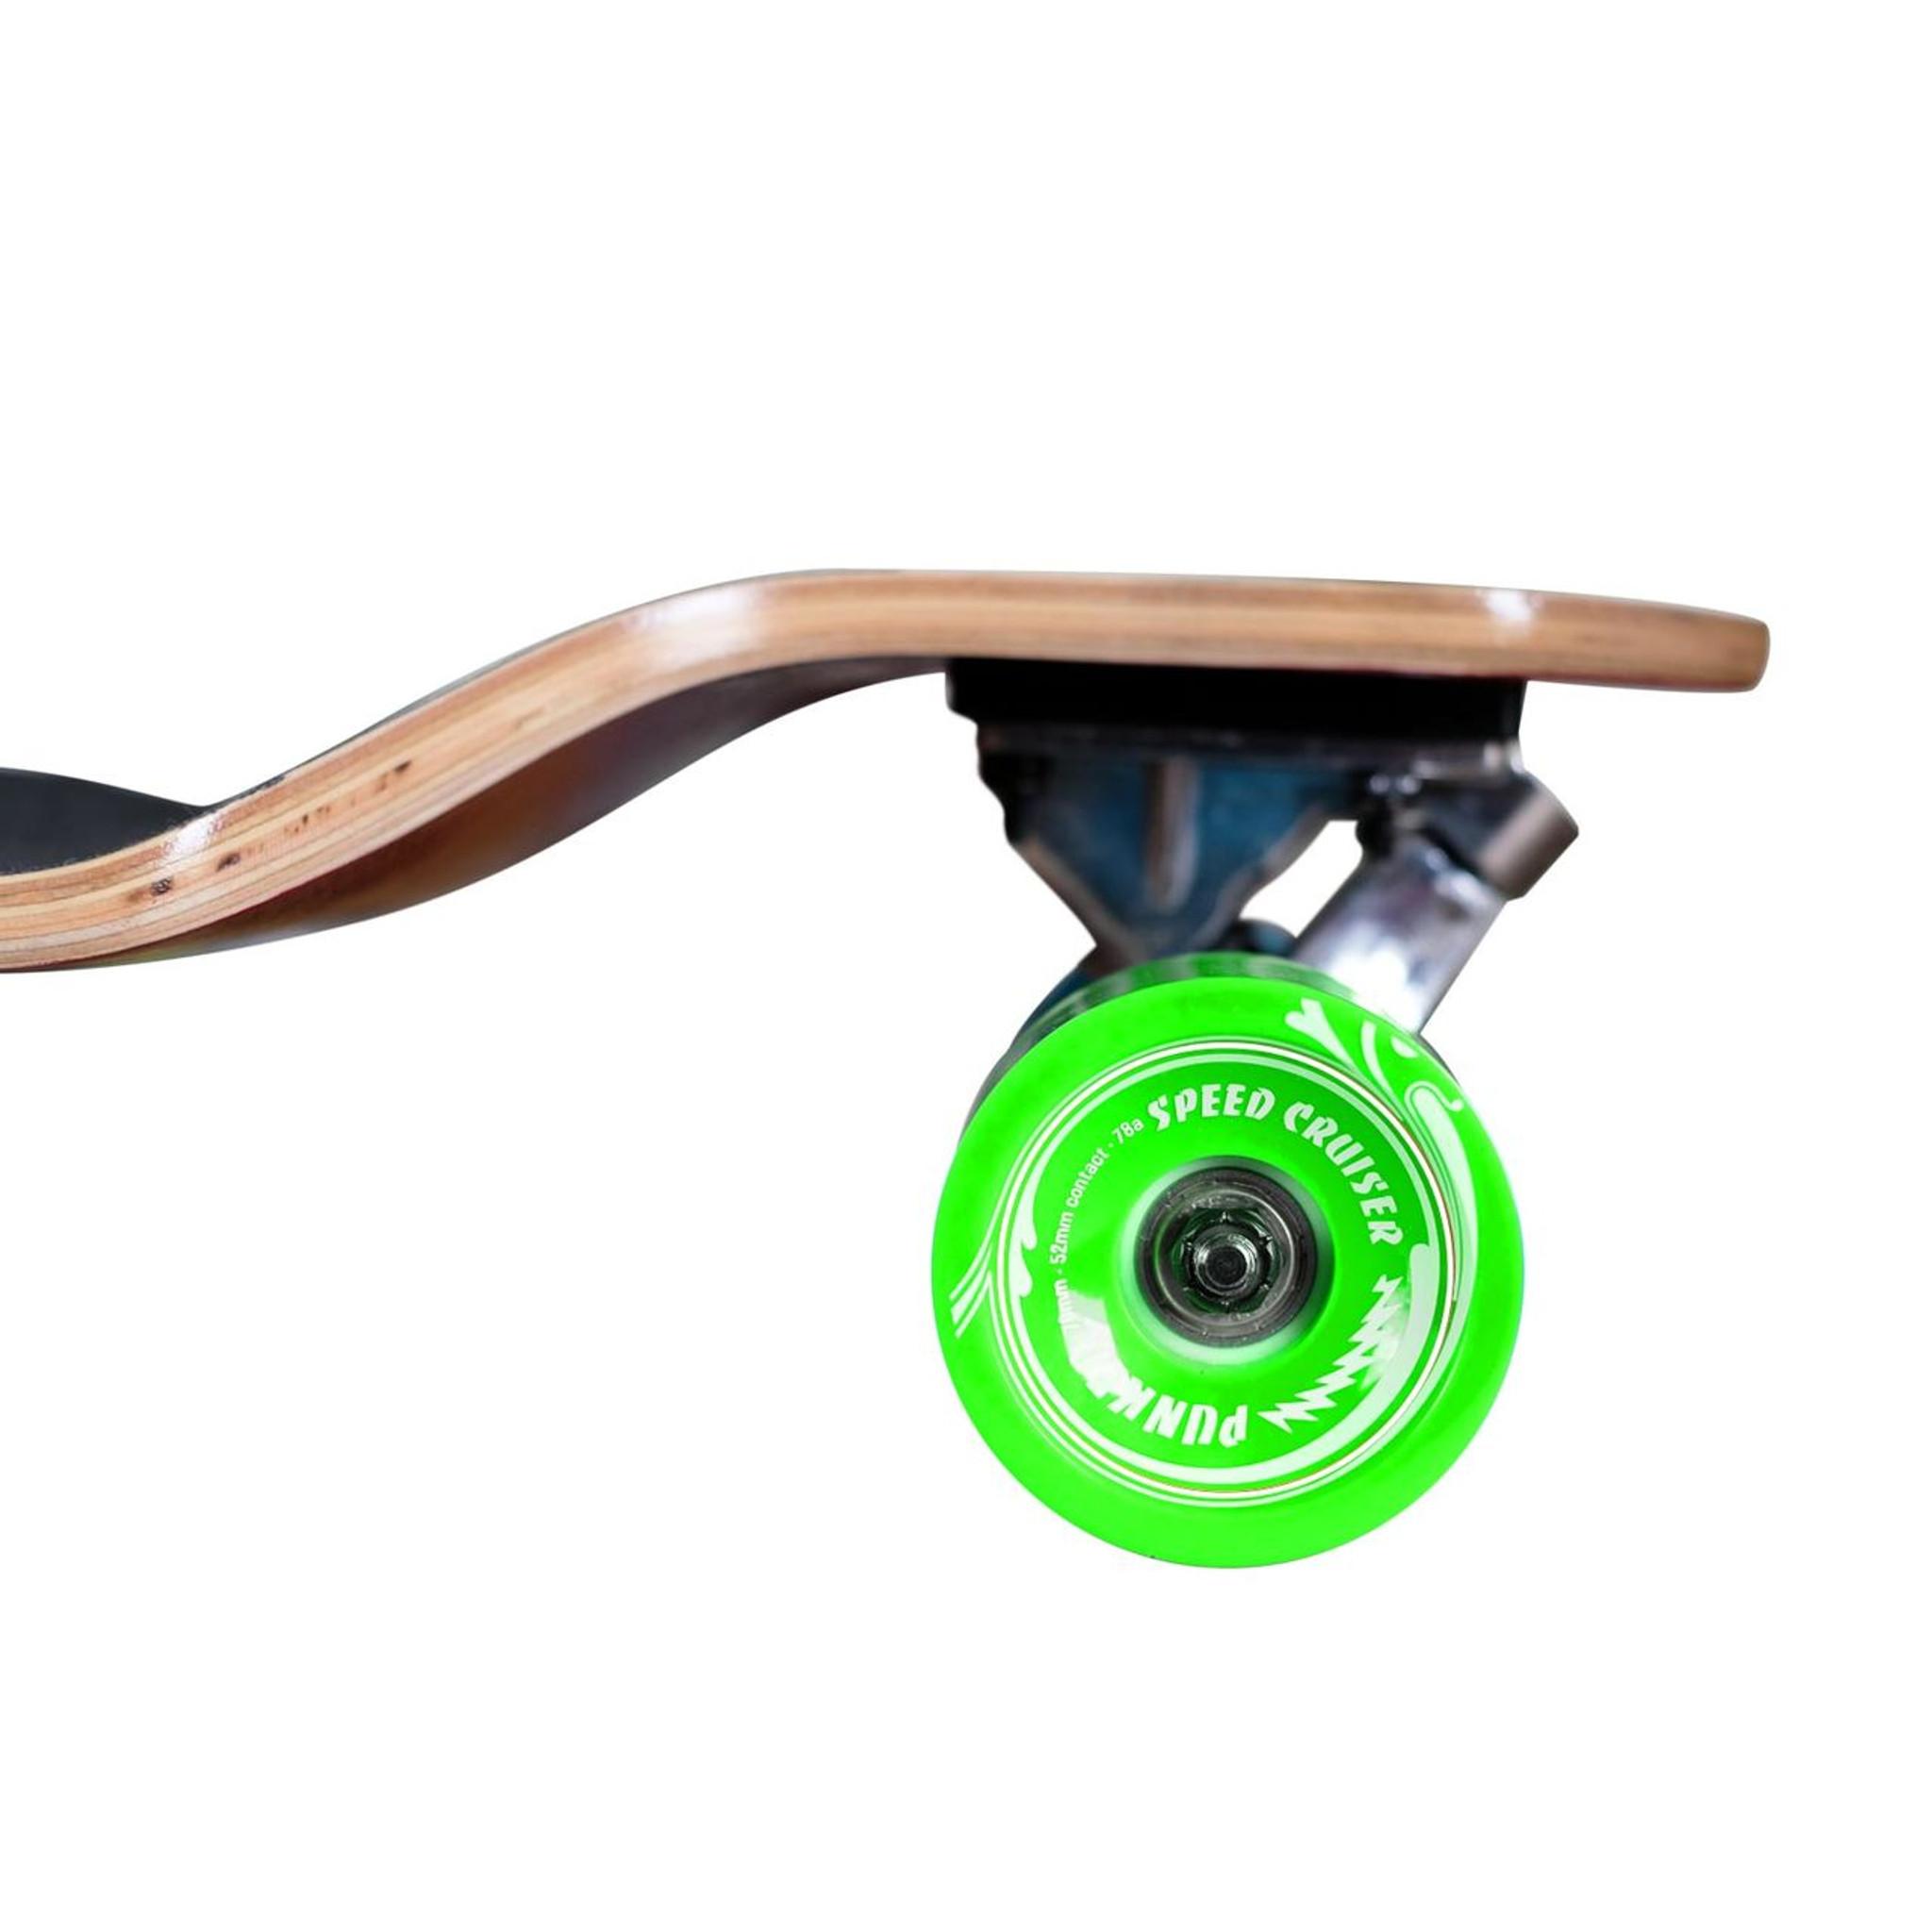 Yocaher Blank//Checker Complete Drop Down Skateboards Longboard Black Widow 80A Grip Tape Aluminum Truck ABEC7 Bearing 70mm Skateboard Wheels